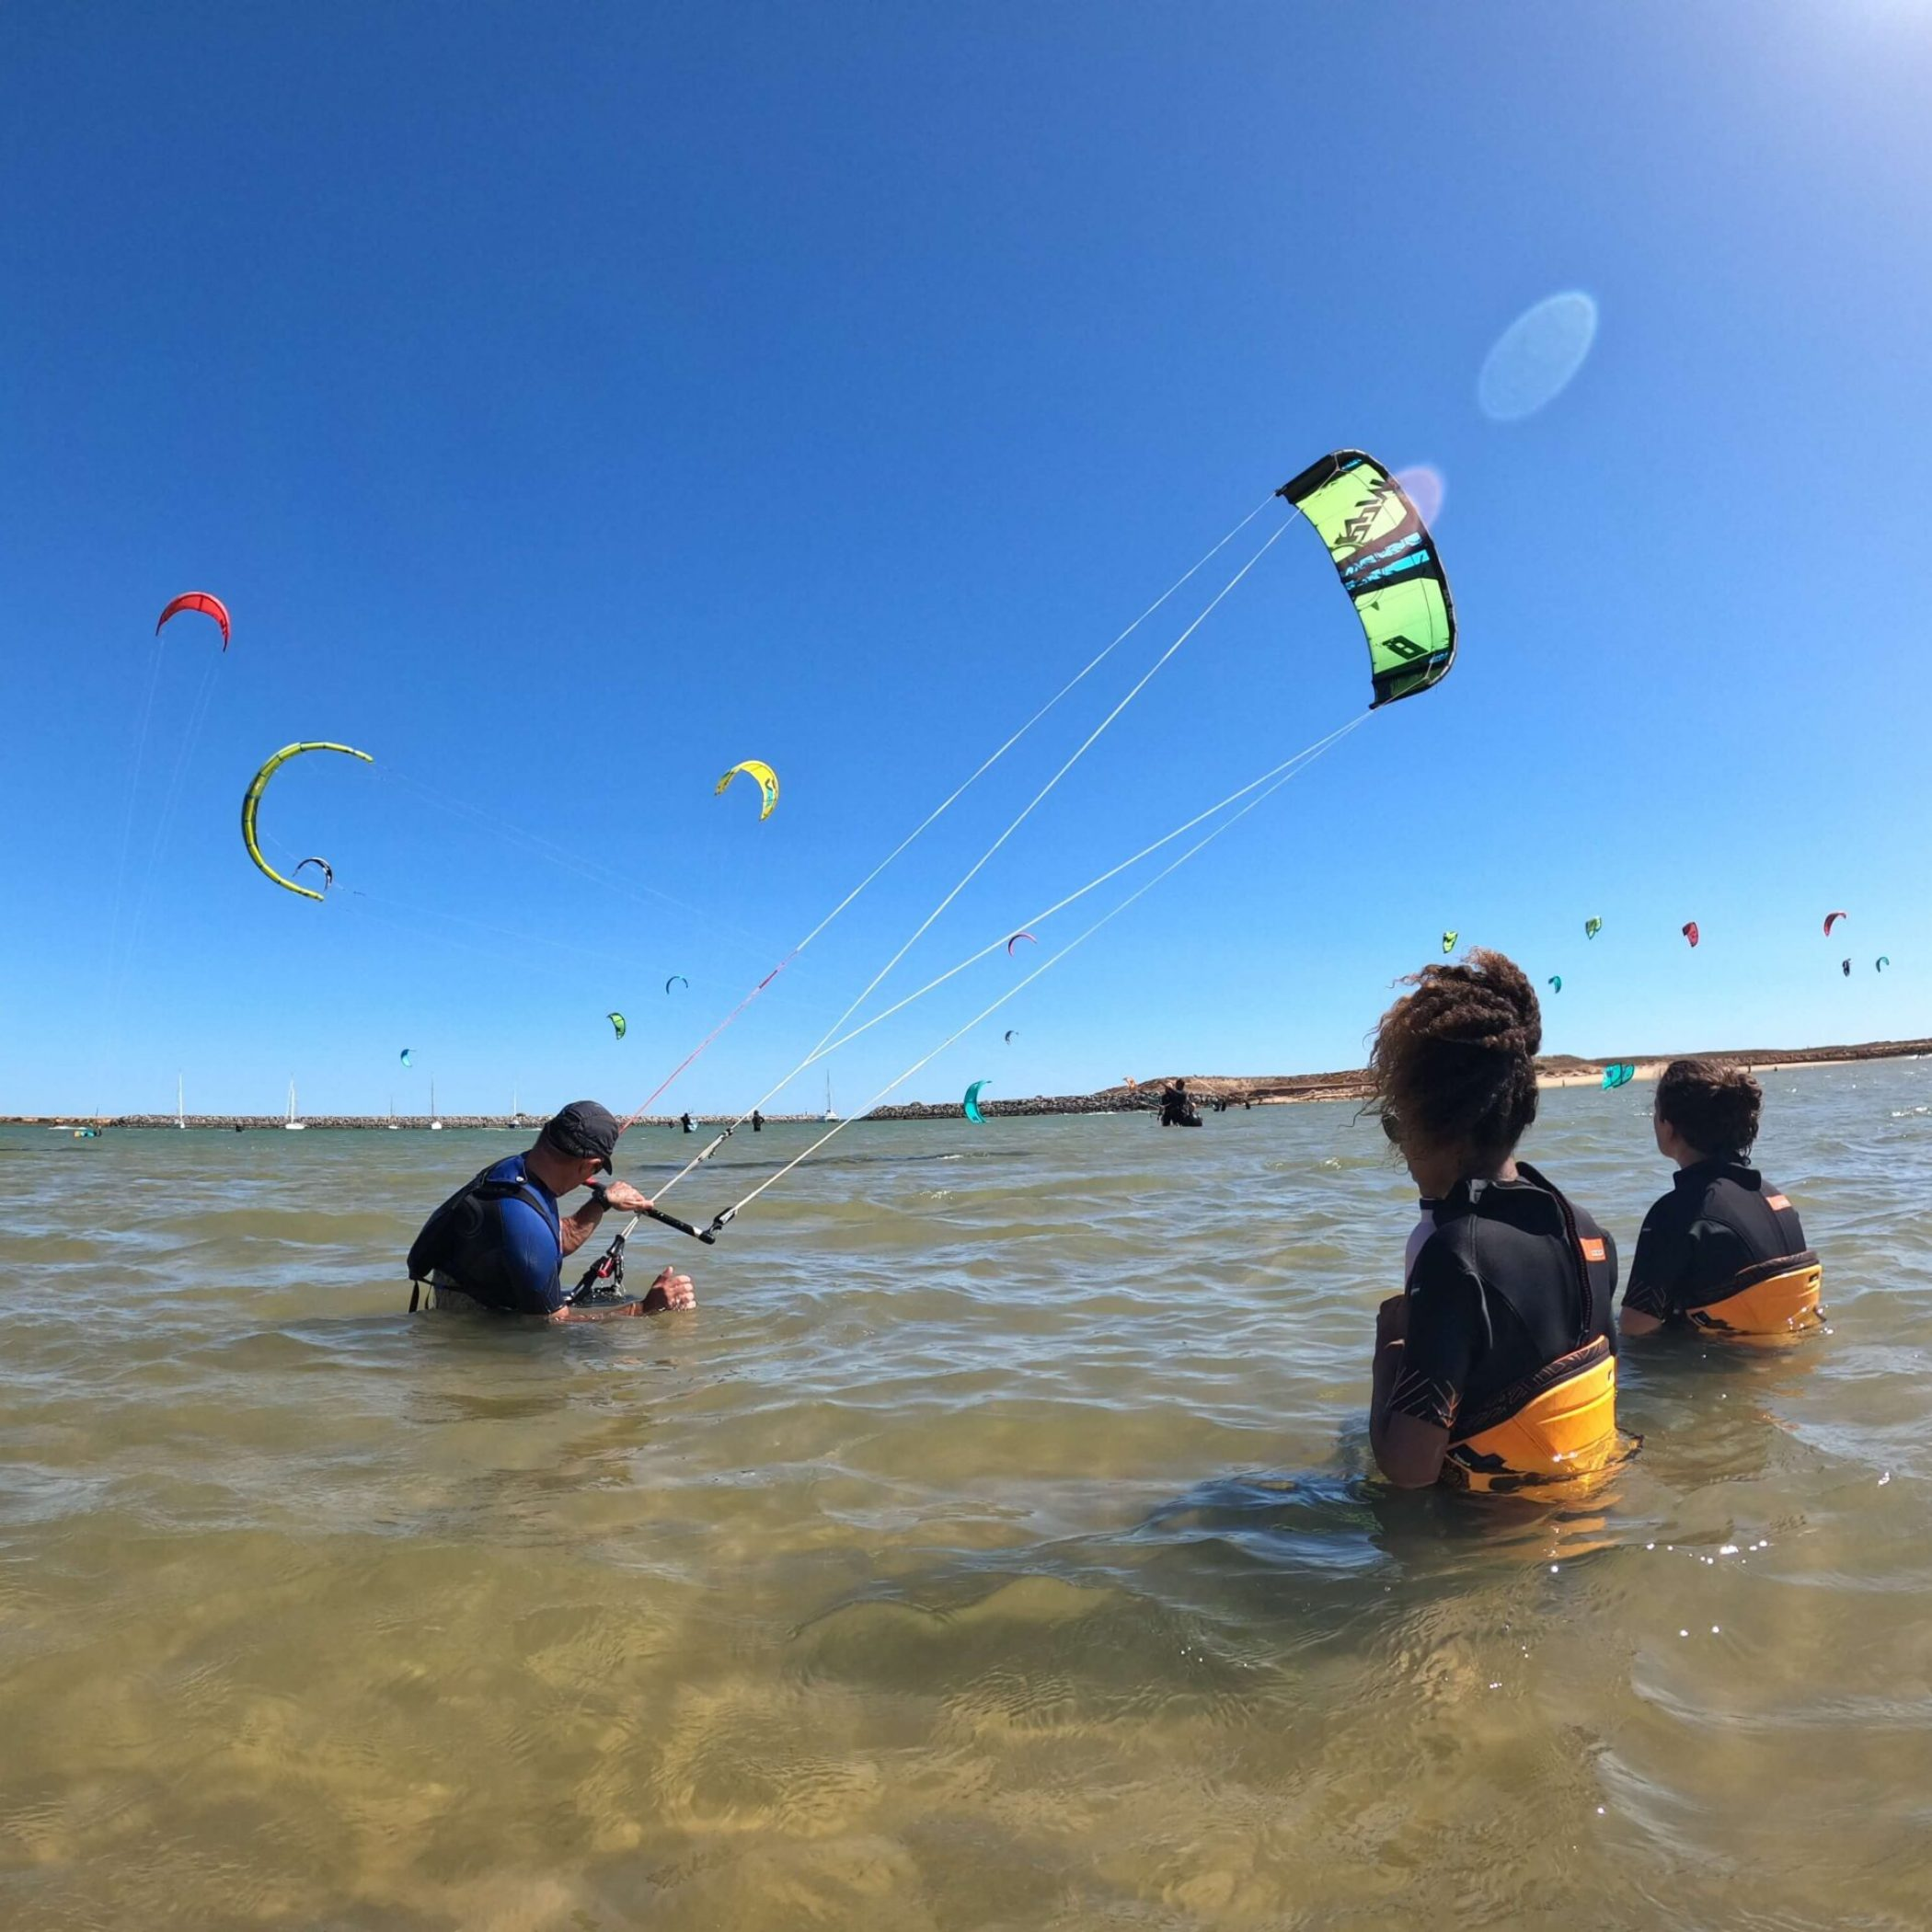 Kitesurf school